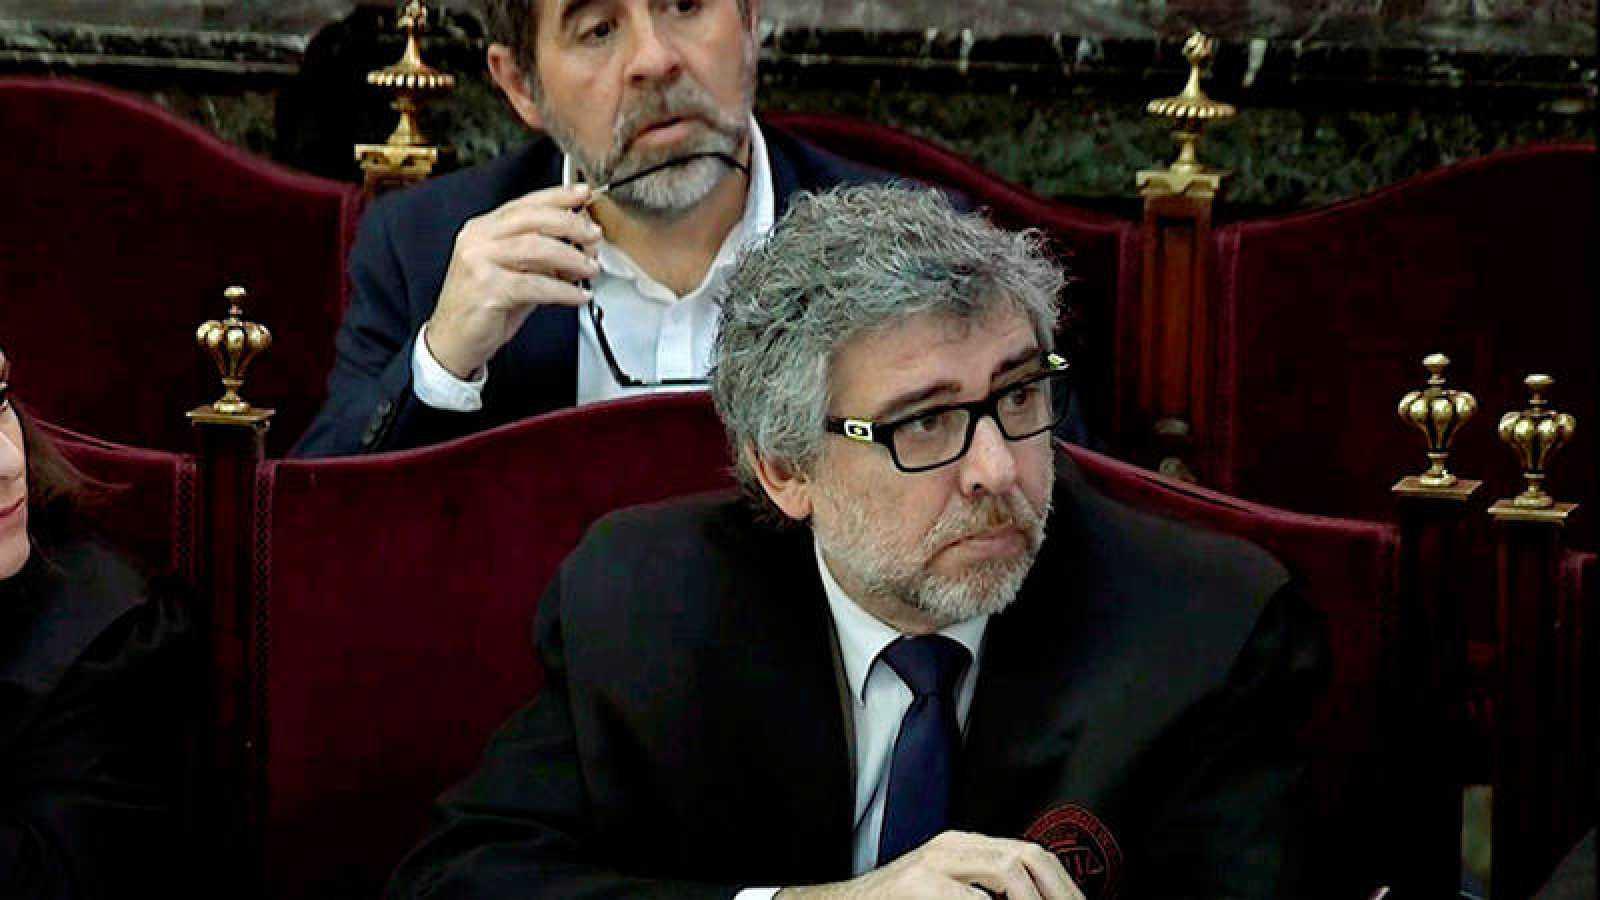 Jordi Pina, abogado de Jordi Turull, Josep Rull y Jordi Sánchez